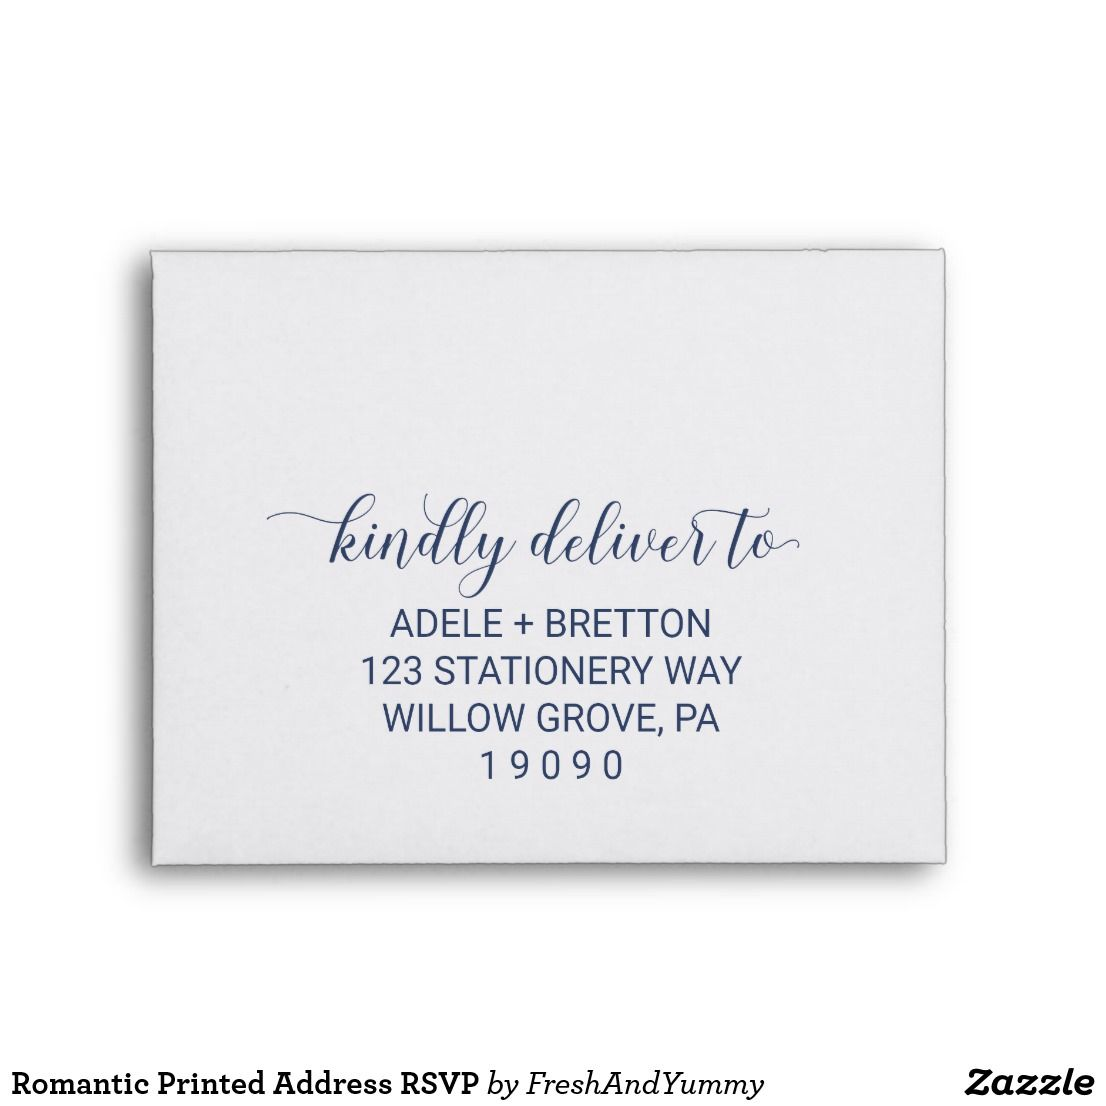 Printing Wedding Invitation Envelopes At Home: Romantic Printed Address RSVP Envelope